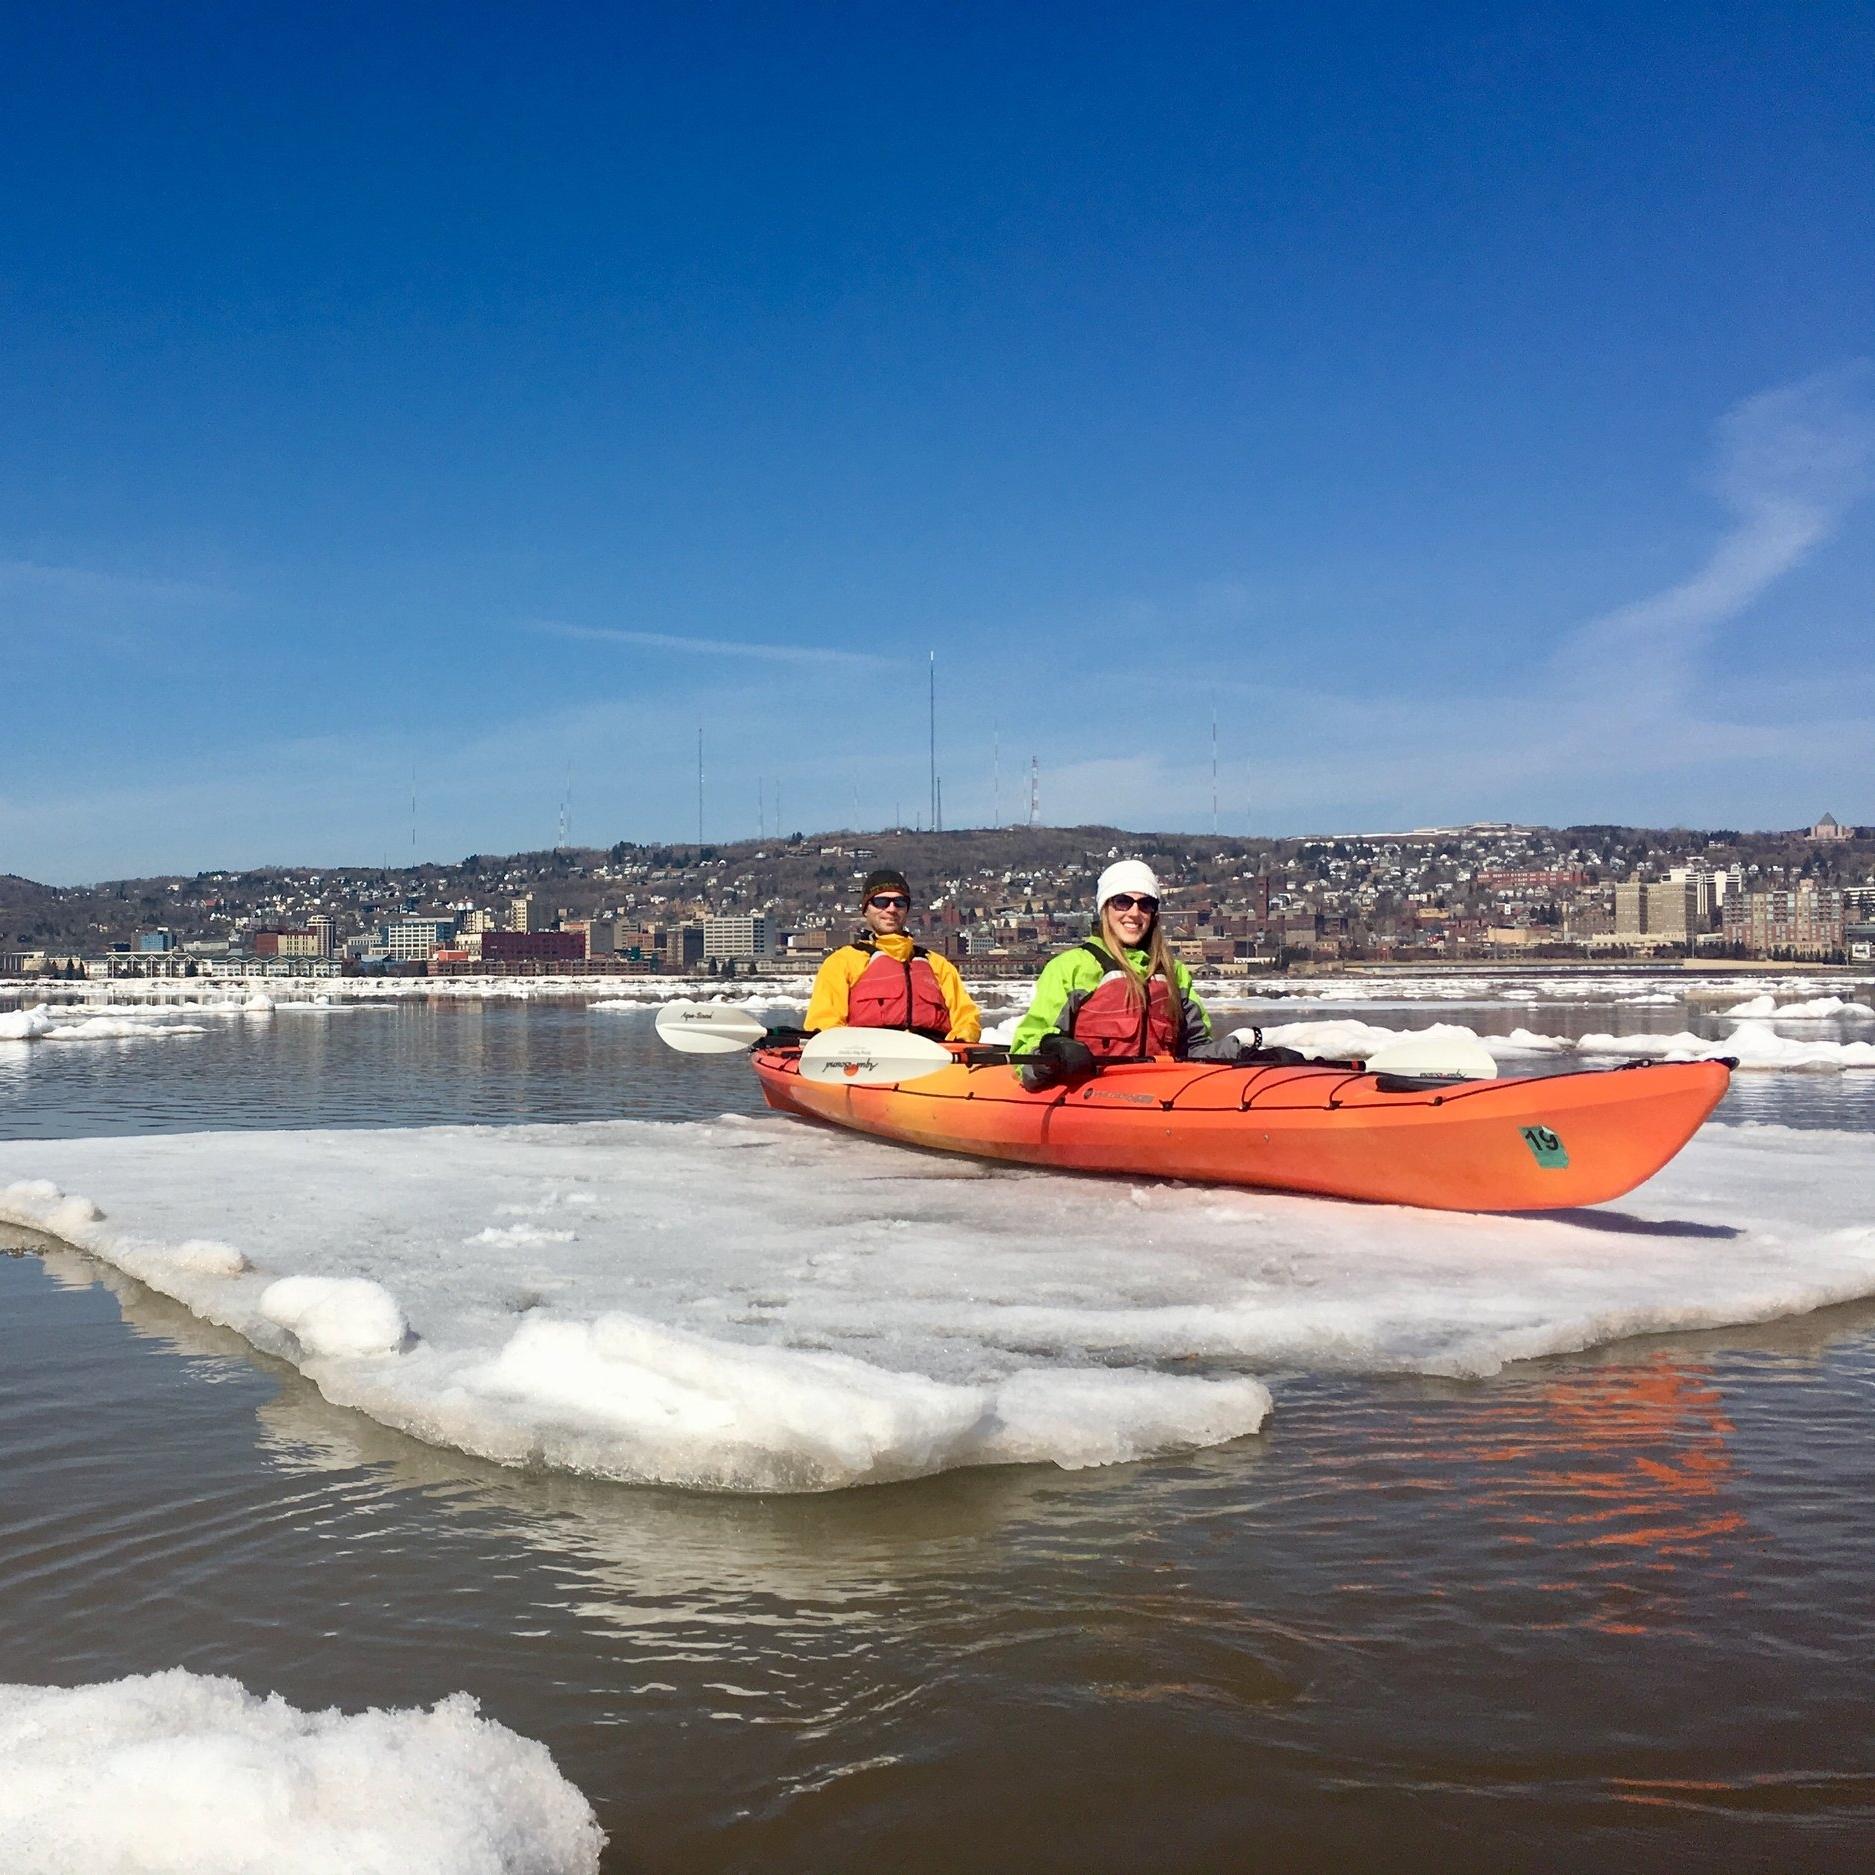 Iceberg Kayak Tour - 2 hours